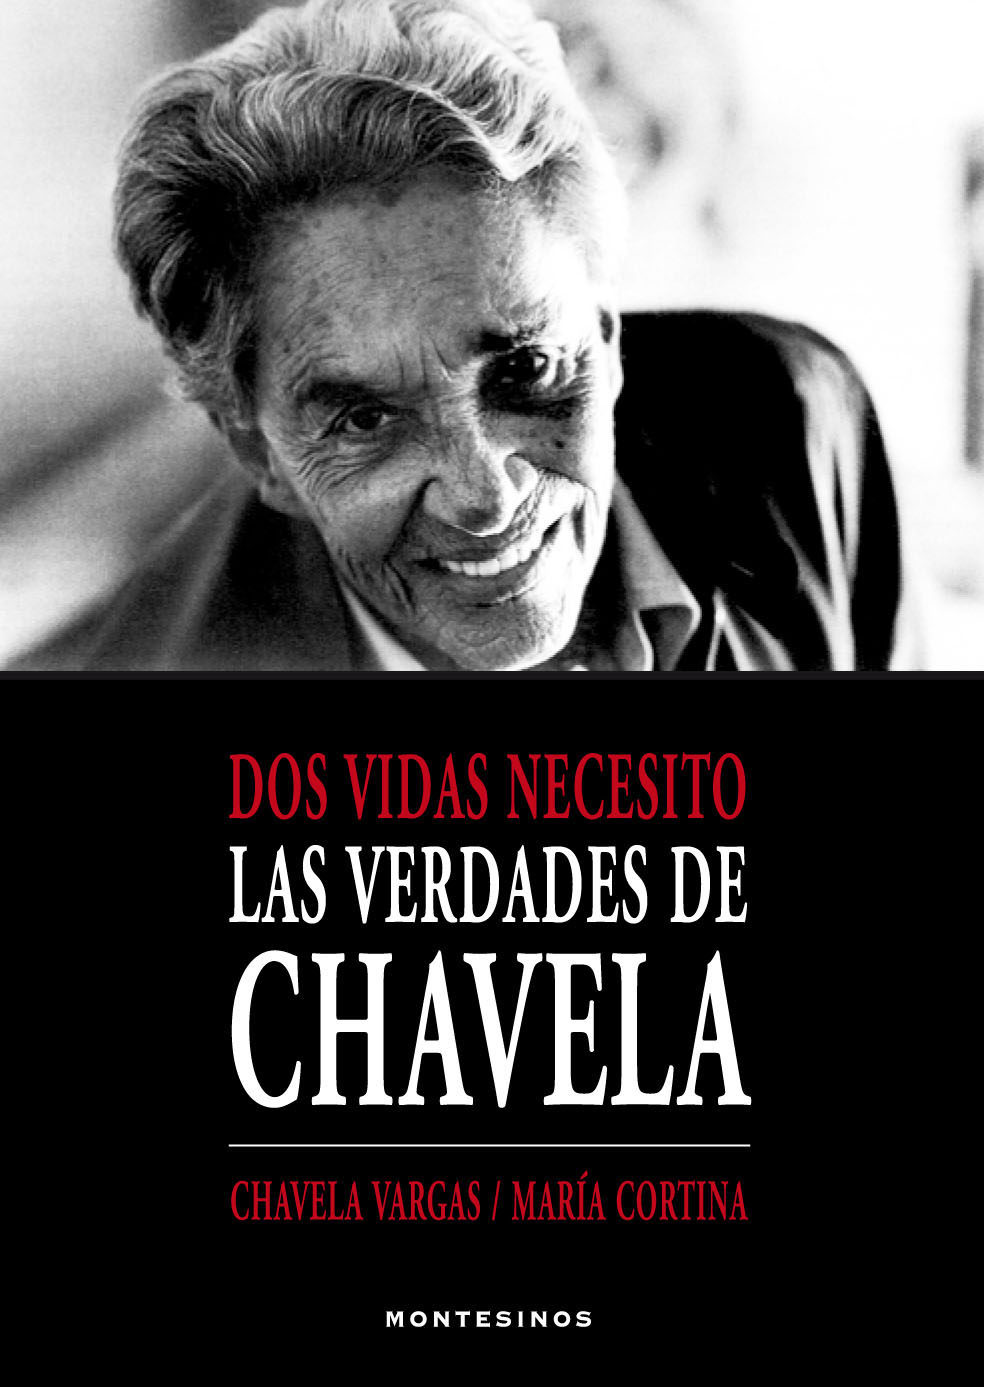 Dos Vidas Necesito: Las Verdades De Chavela (montesinos) por Chavela Vargas;                                                           Maria Cortina